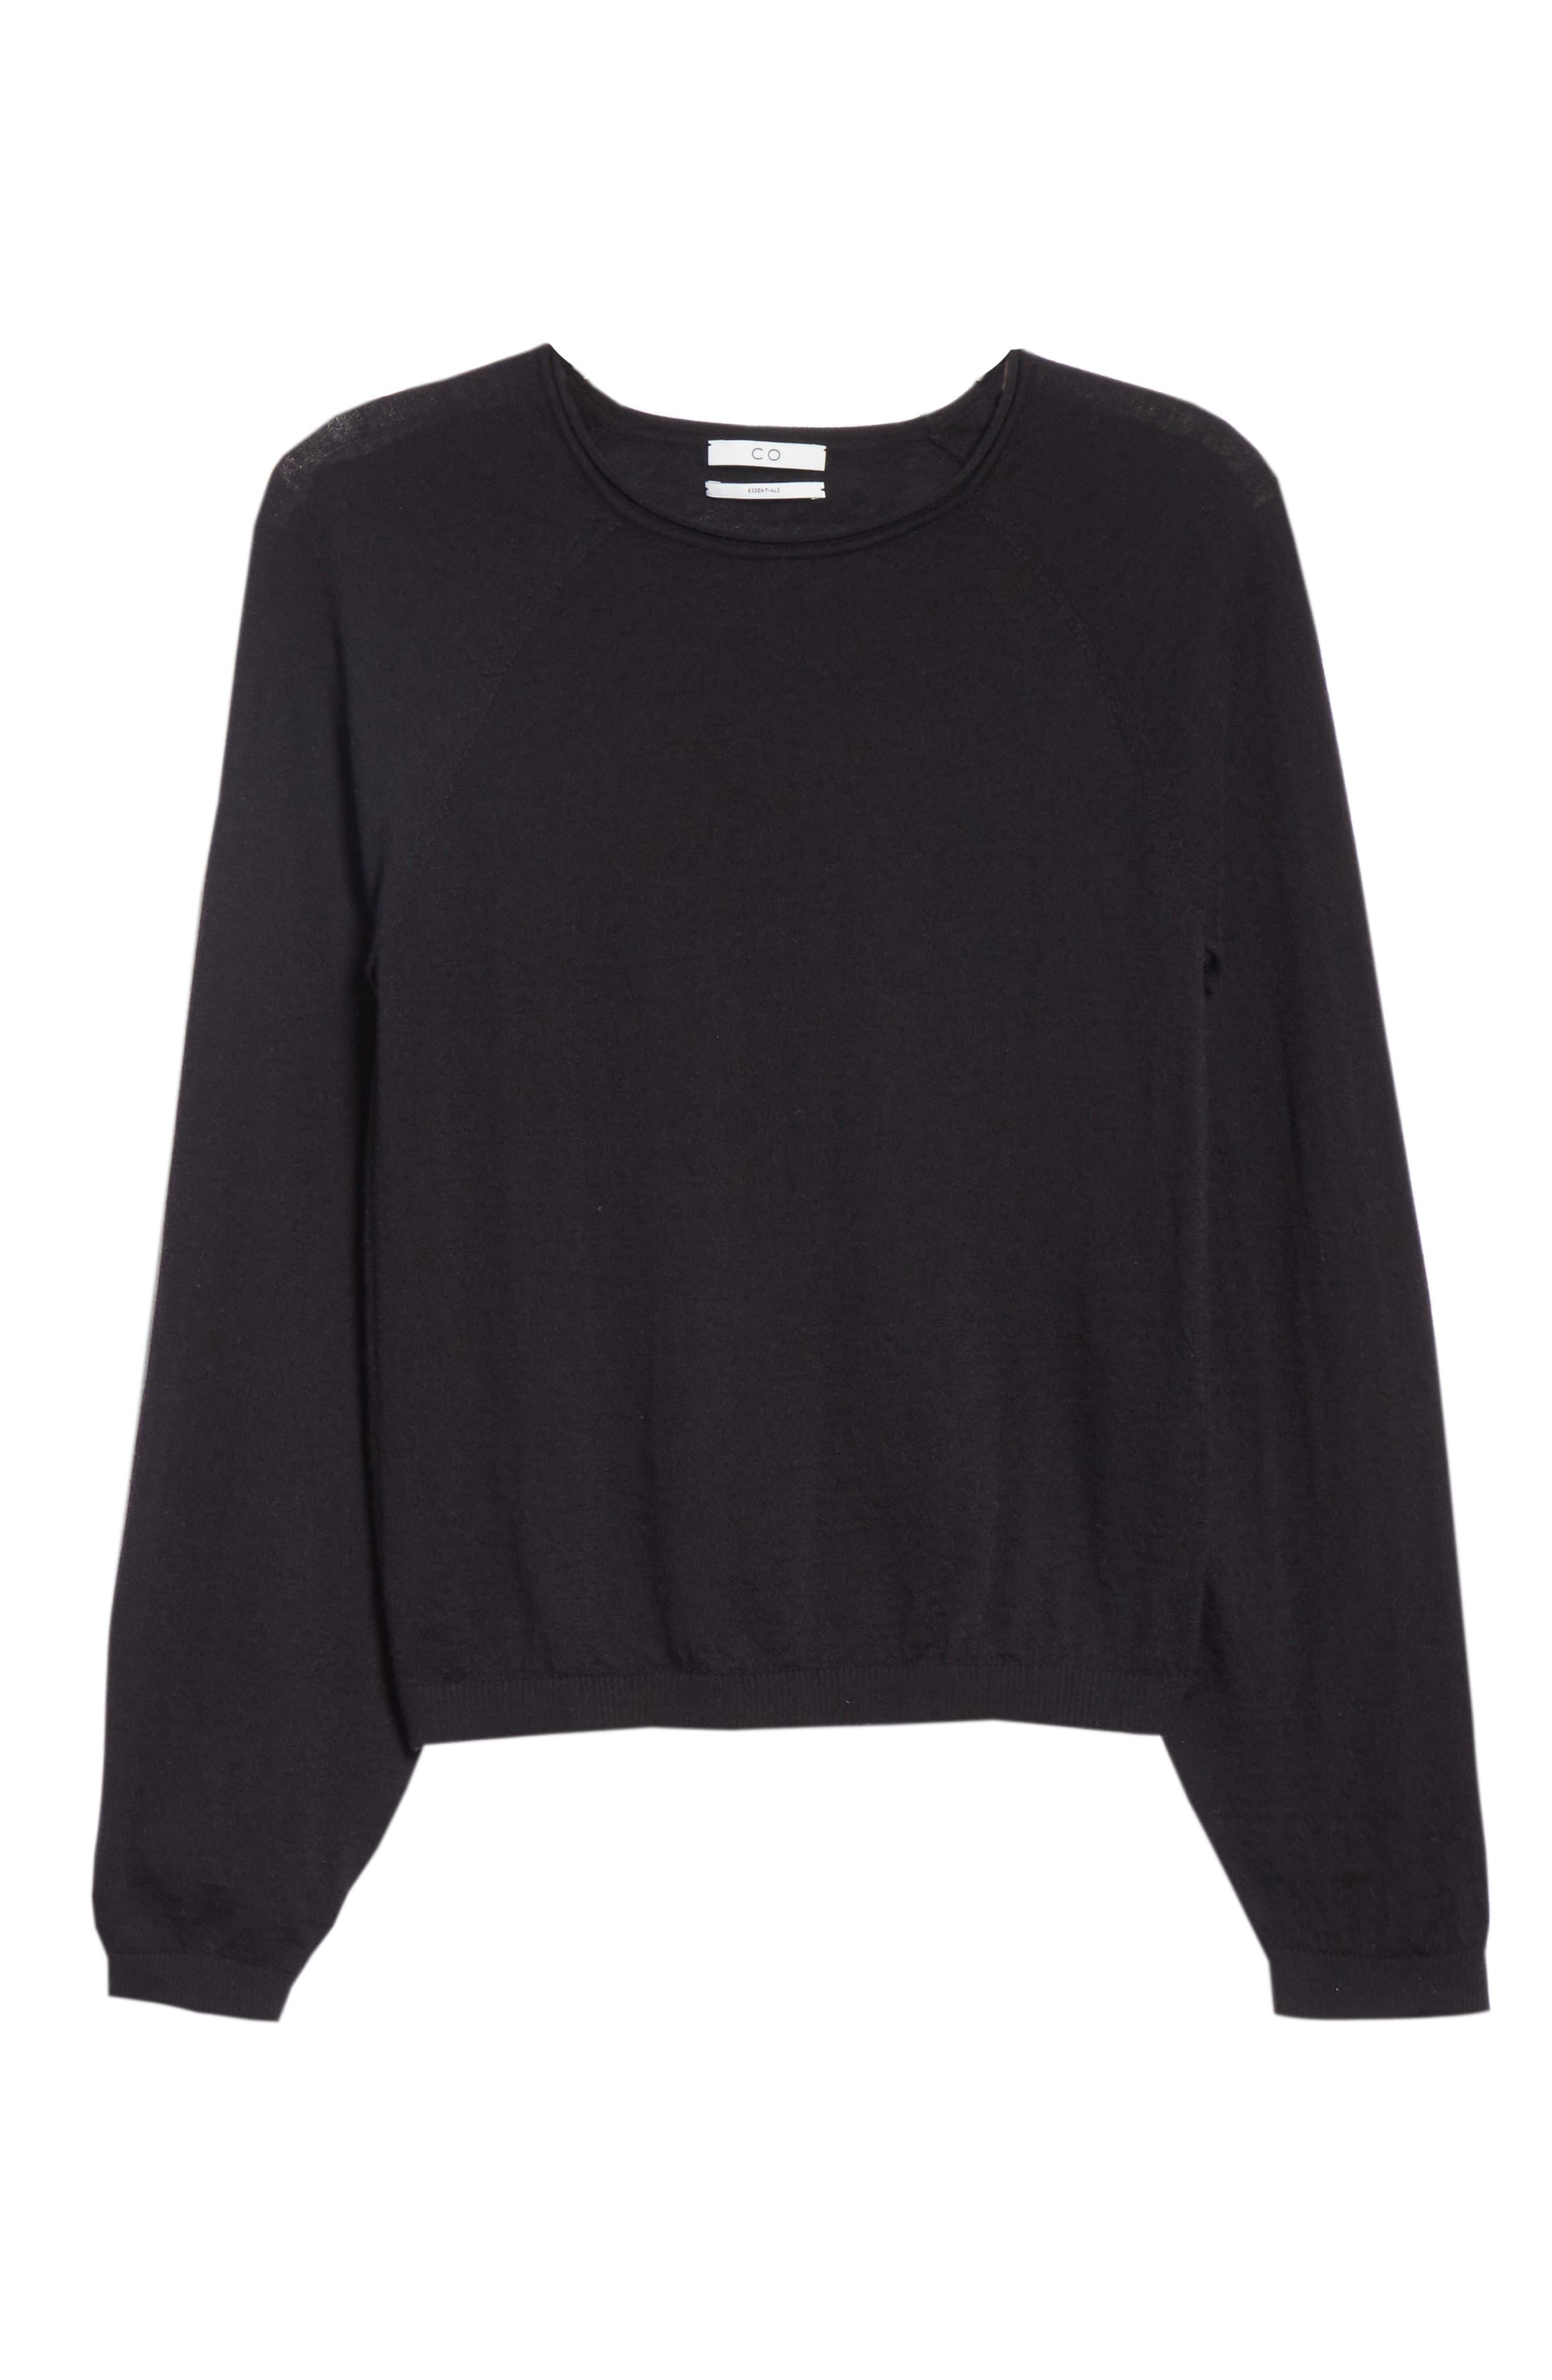 CO, Essentials Cashmere Sweater, Alternate thumbnail 6, color, BLACK